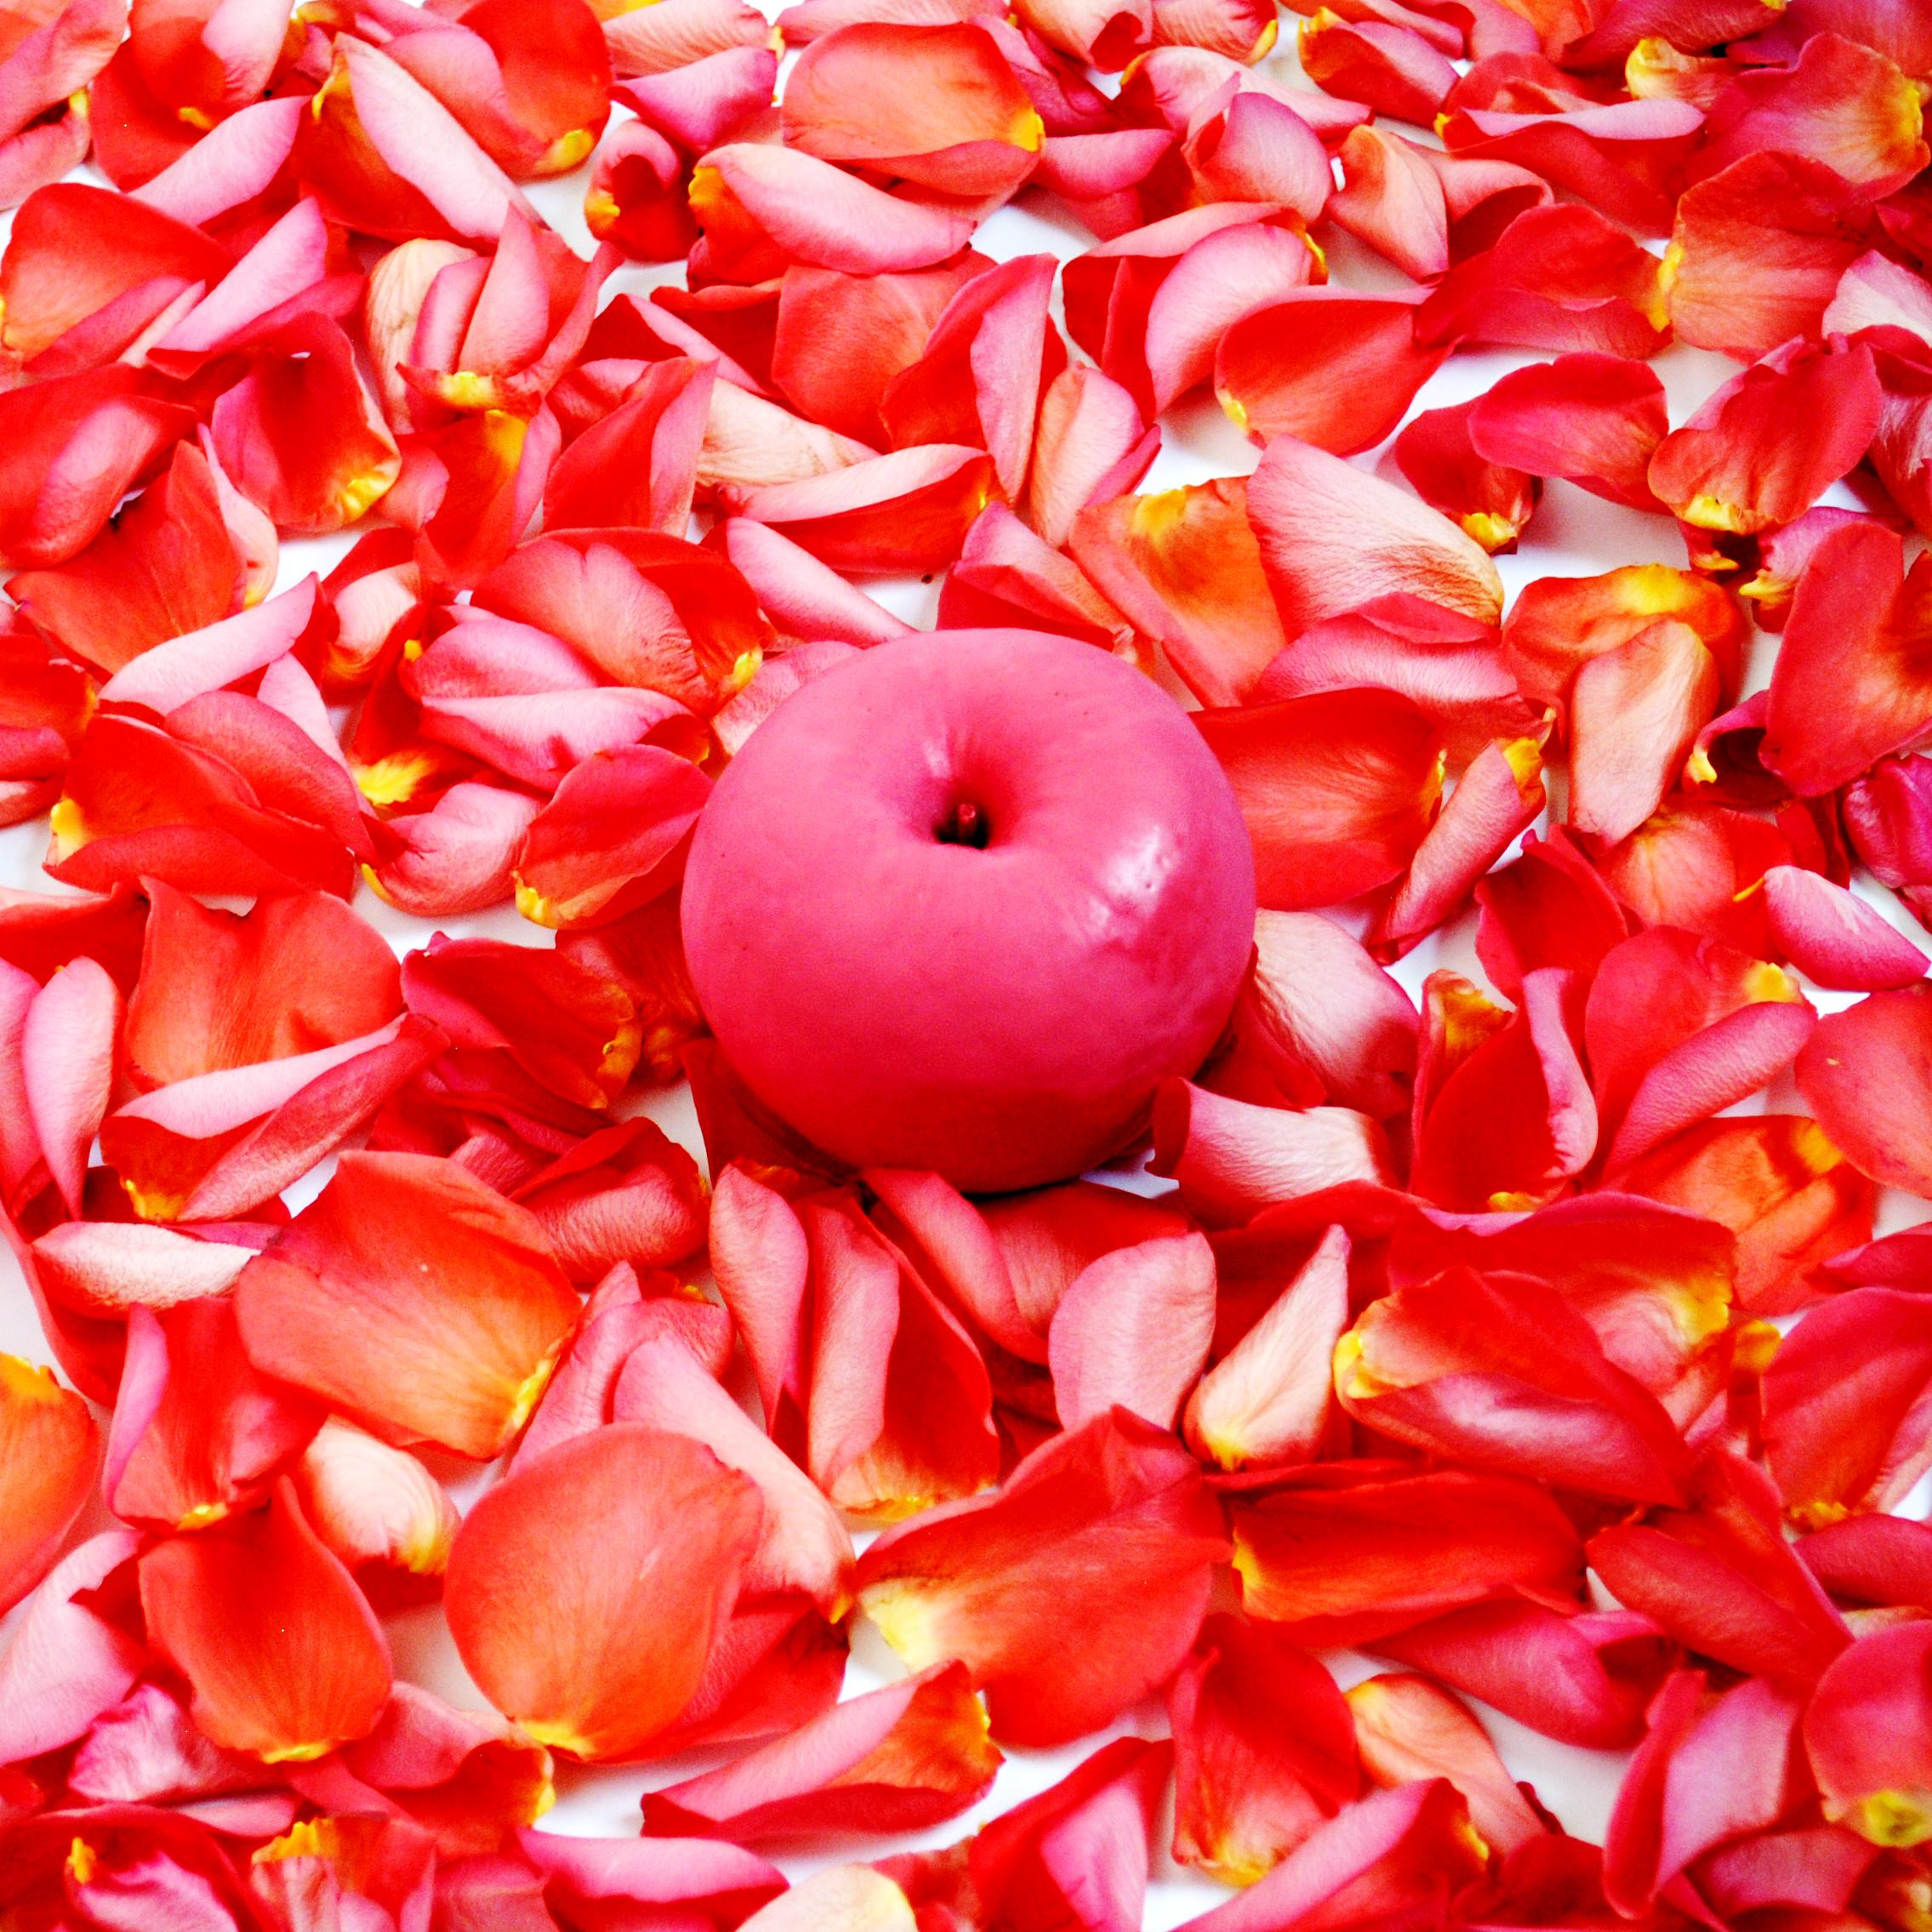 SaraChaudhuri-ApplesAmericanBeauty